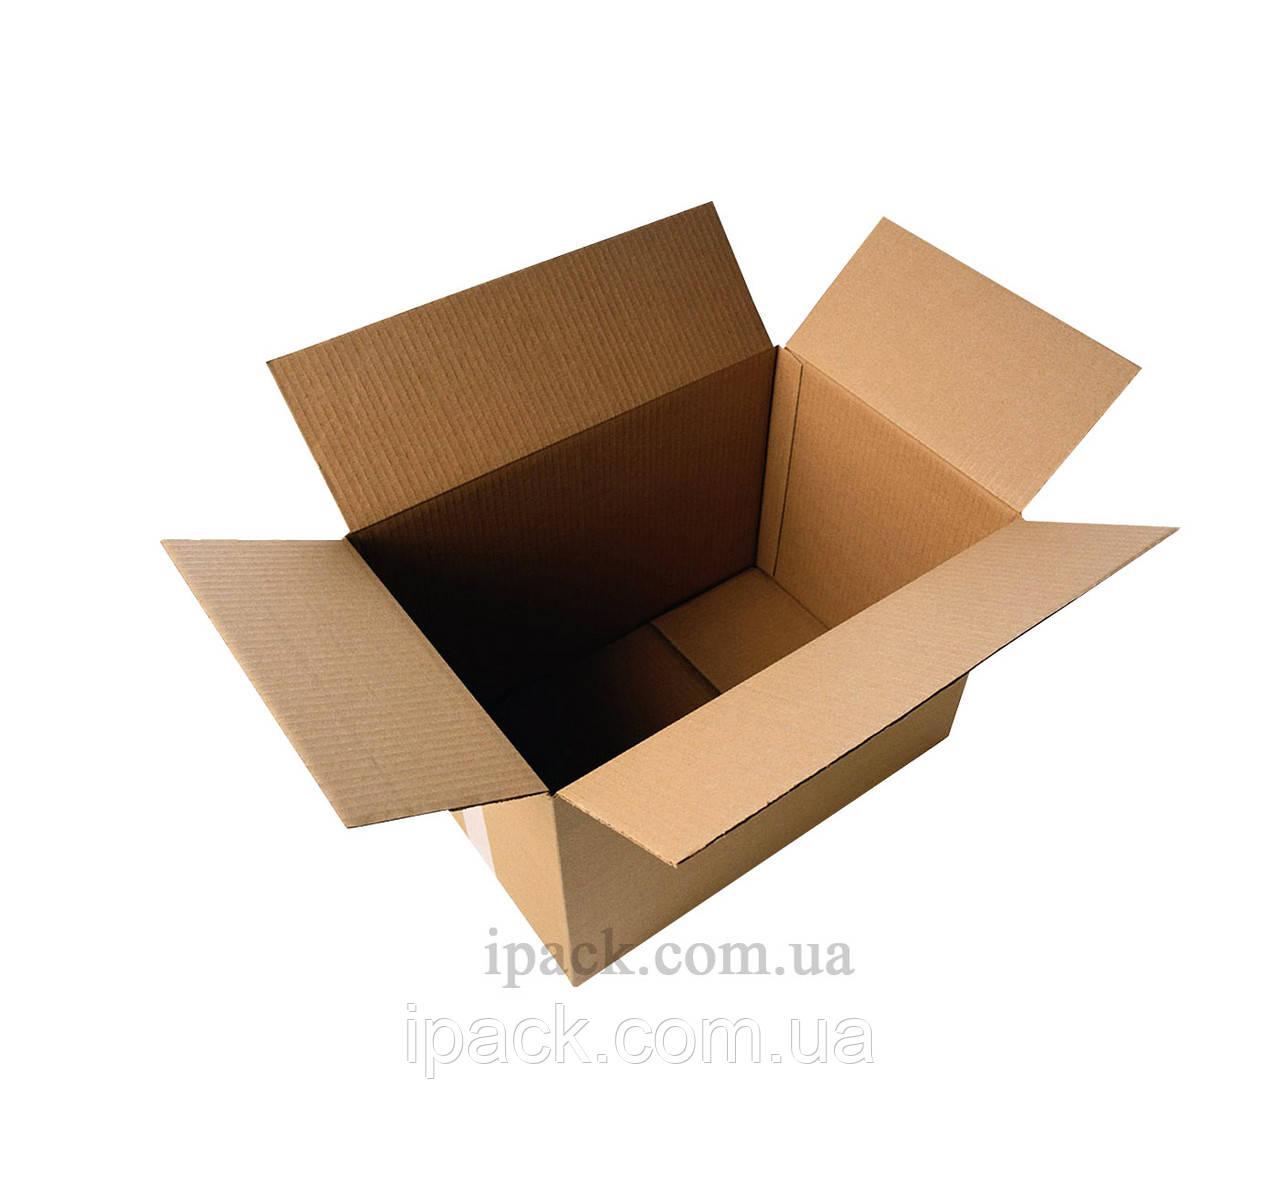 Гофроящик 365*245*525 мм, бурый, четырехклапанный картонный короб